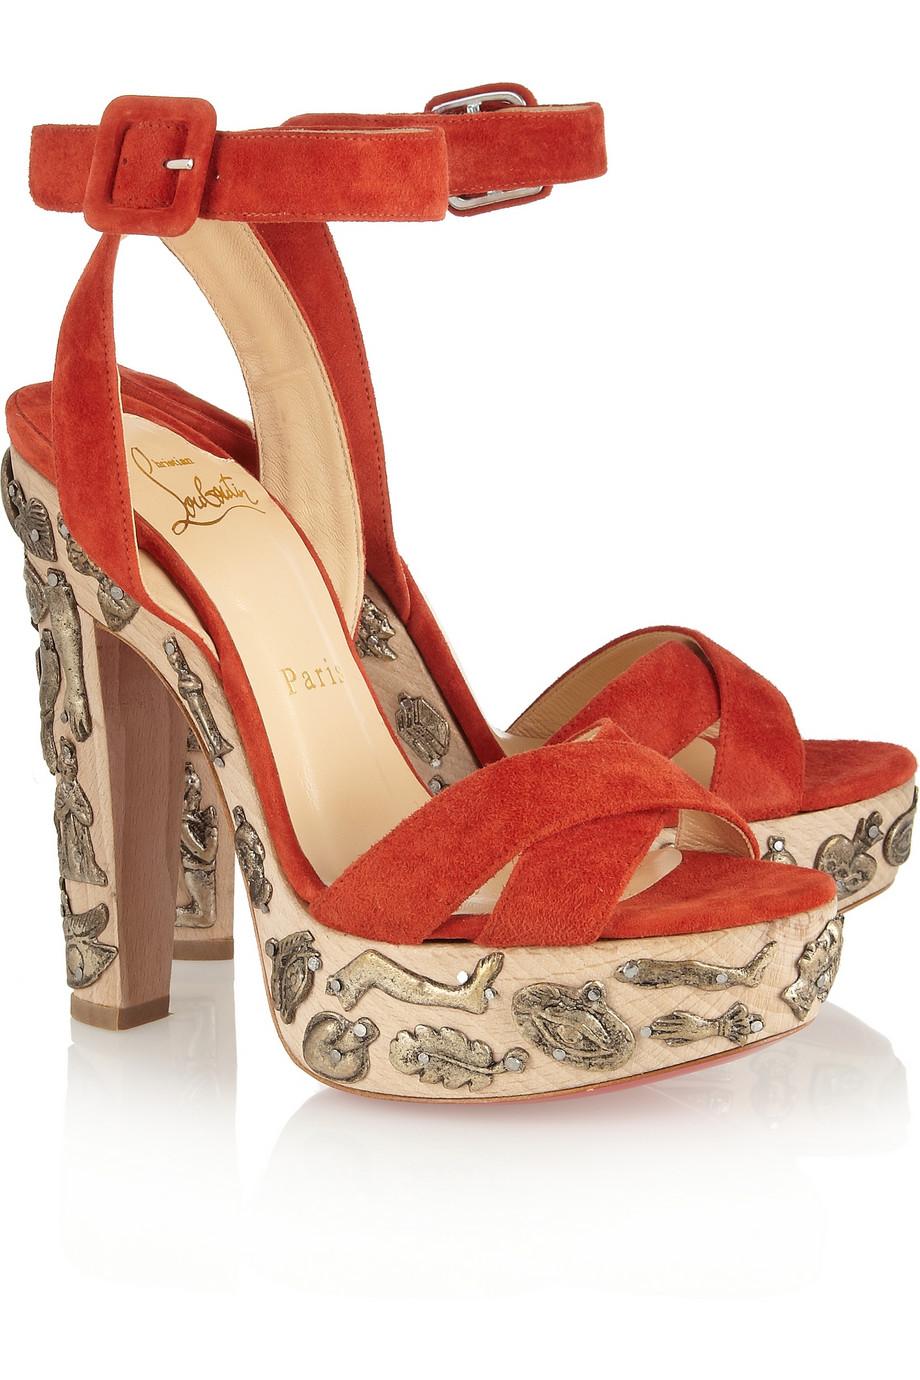 CHRISTIAN LOUBOUTIN Exvota 140 metal-appliquéd suede sandals